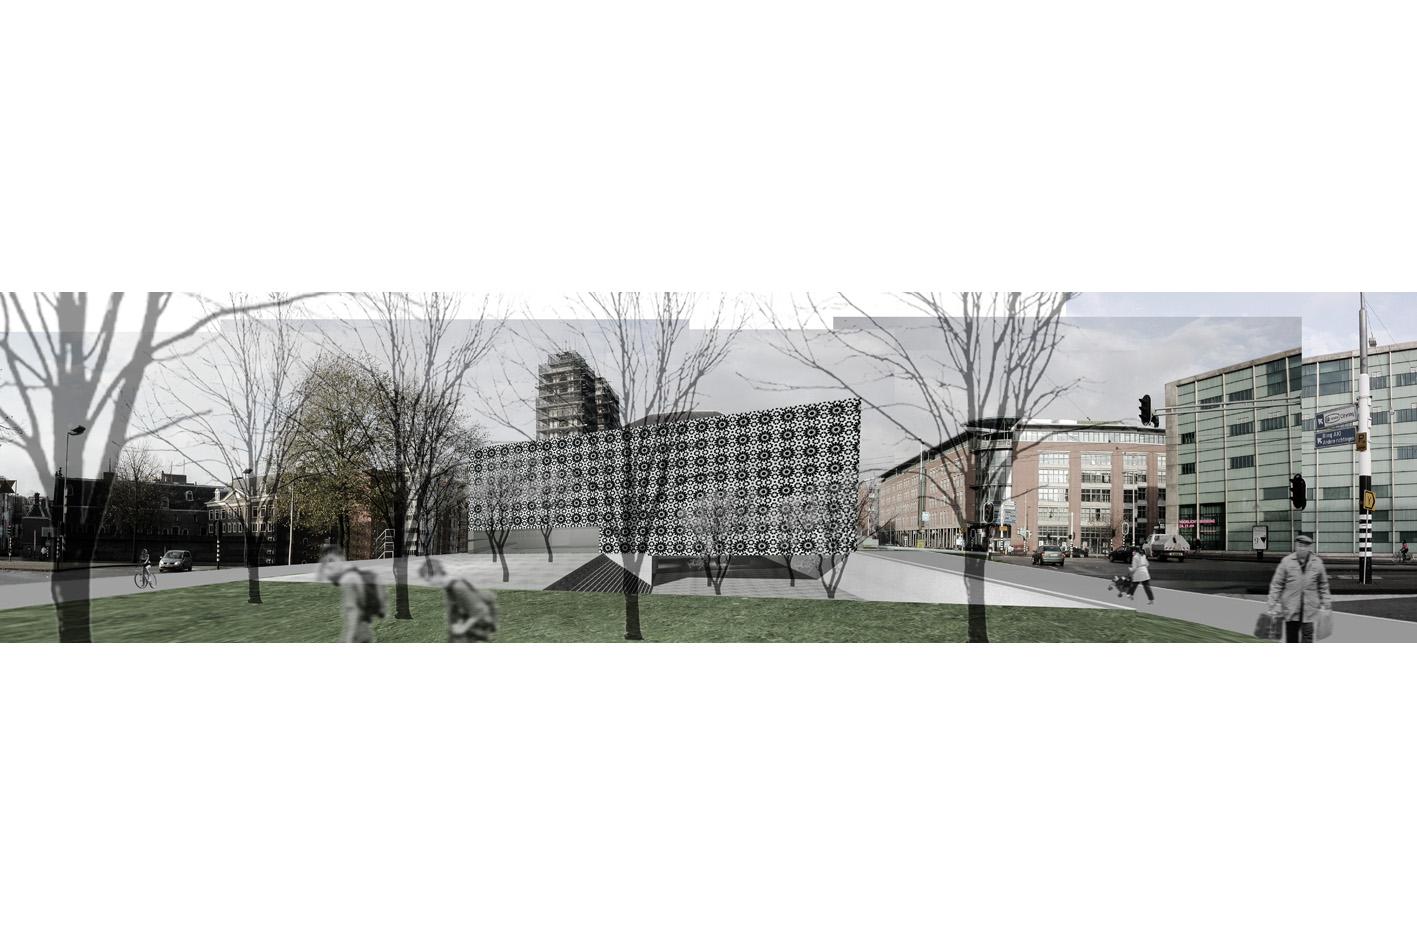 Nederlands Islamitisch Cultureel Instituut Amsterdam mr visserplein Atelier PUUUR prix de rome kaart panorama